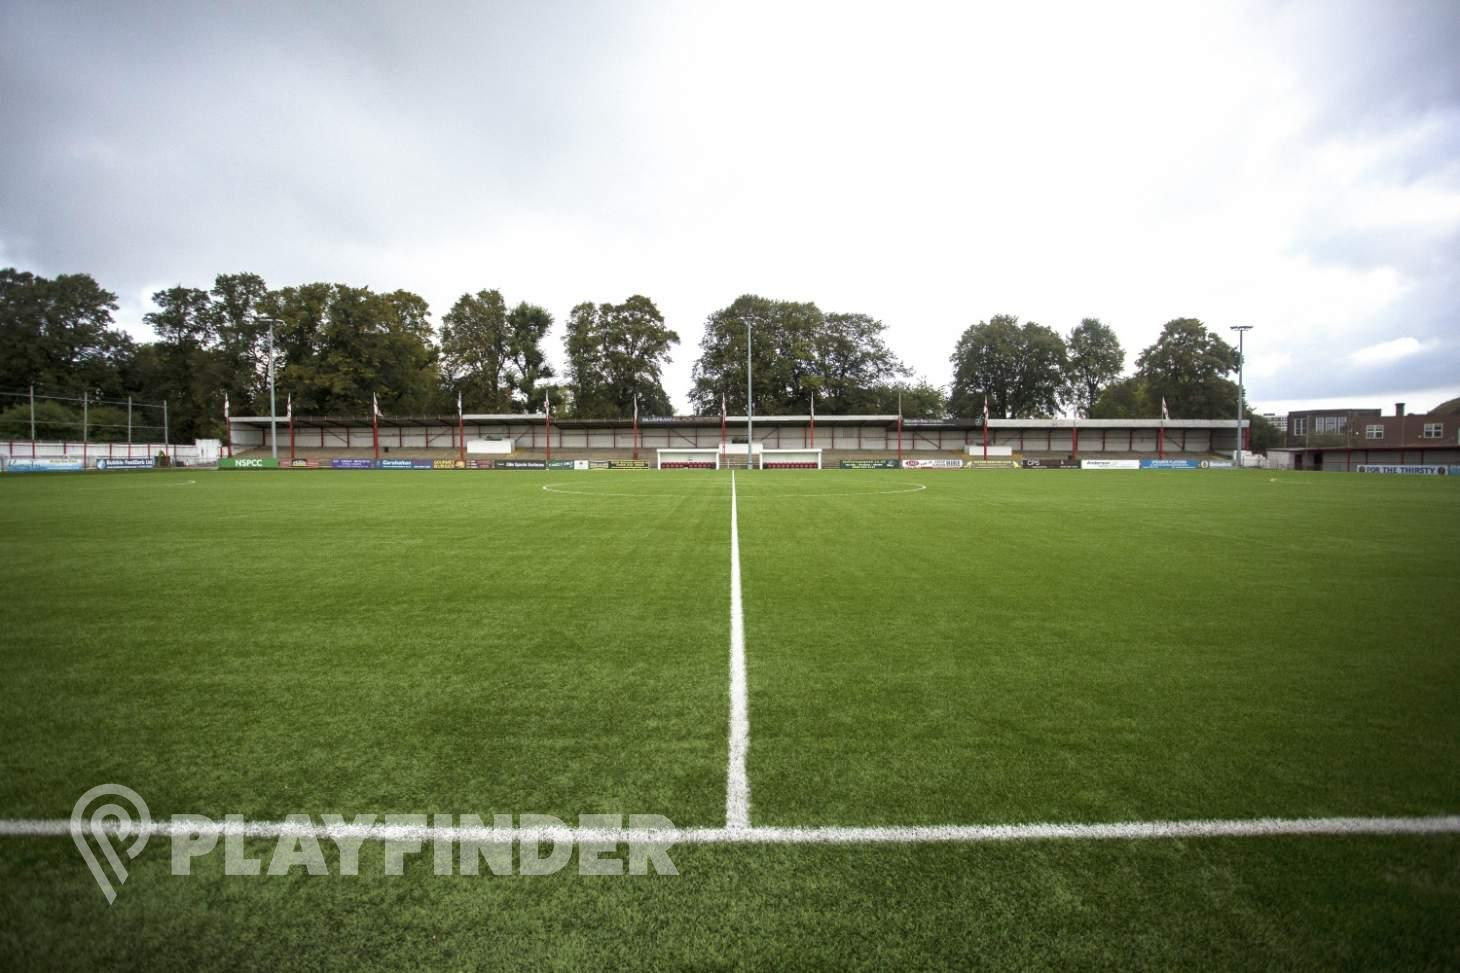 Colston Avenue Football Stadium 11 a side | 3G Astroturf football pitch